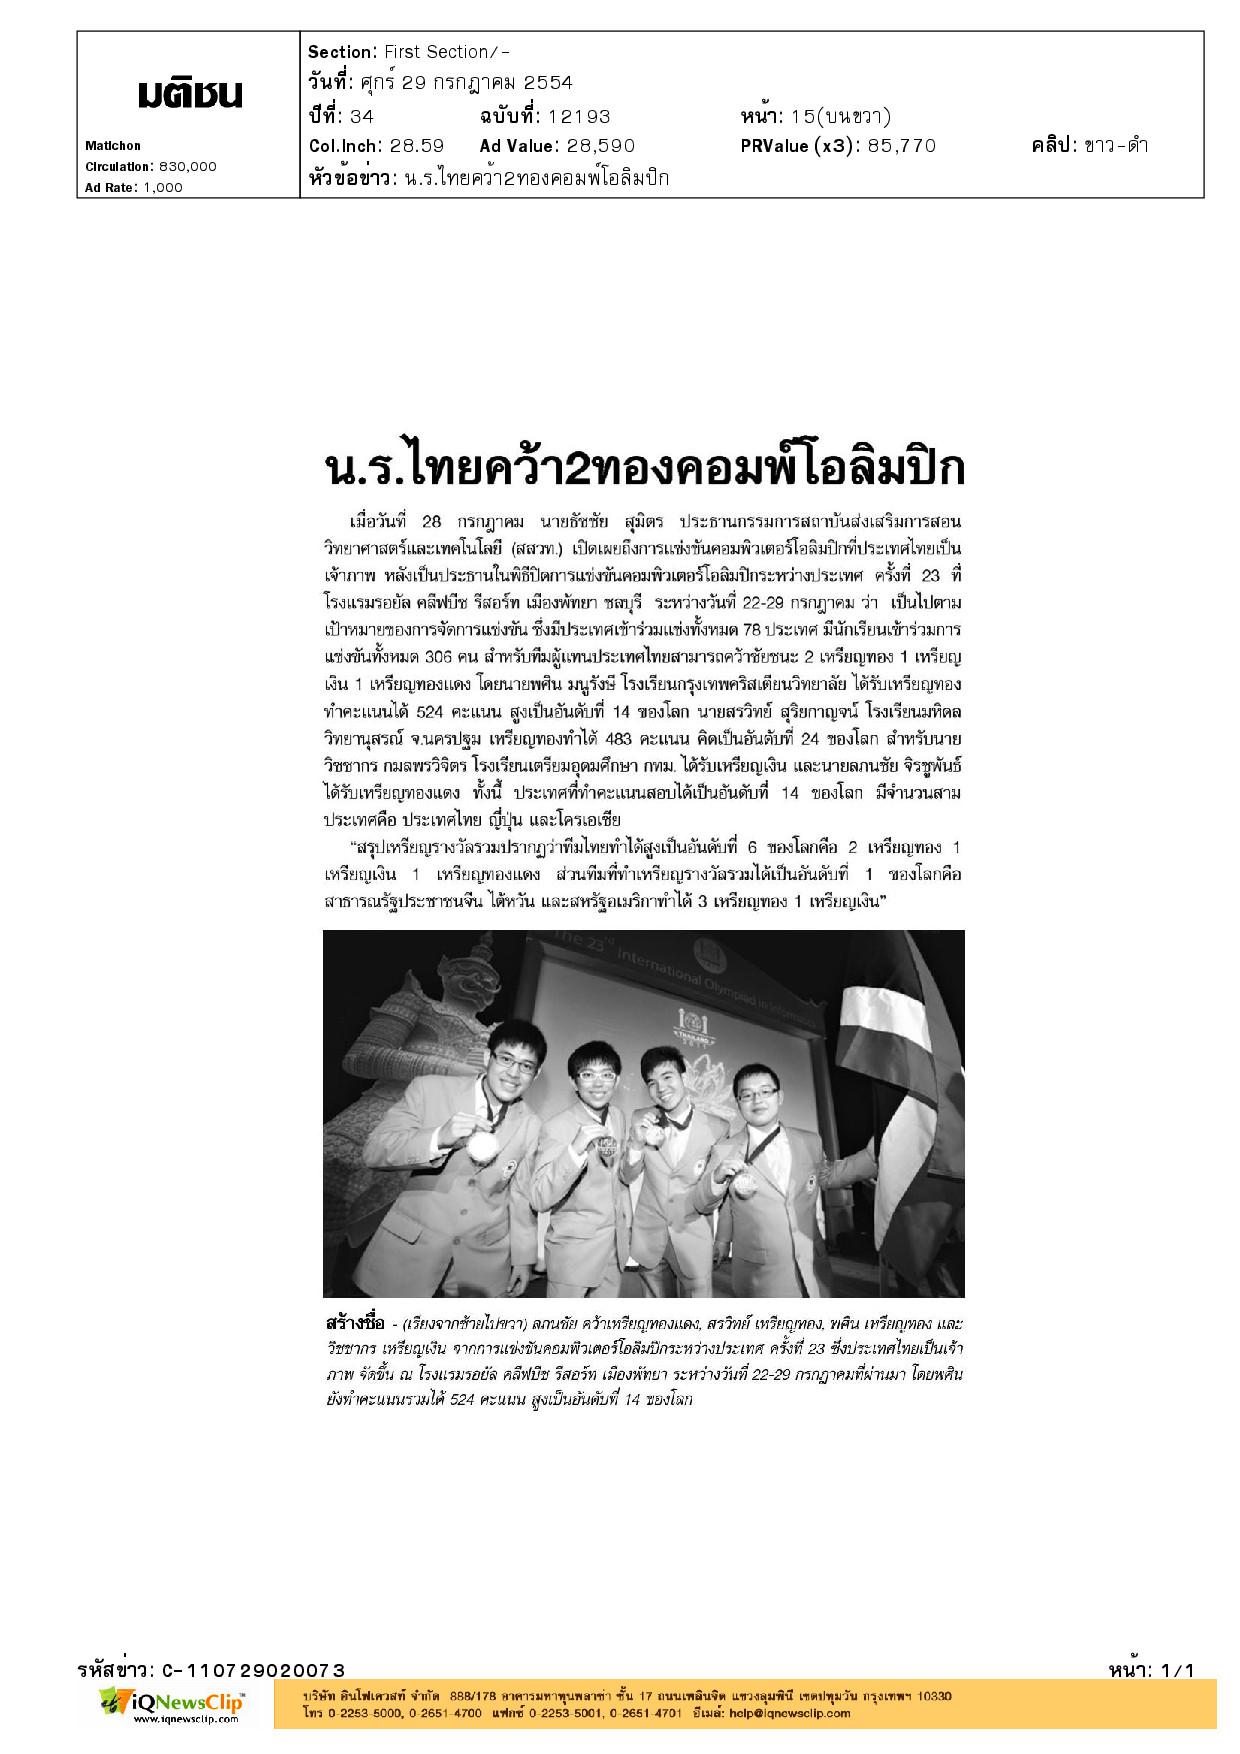 C-110729020073.pdf